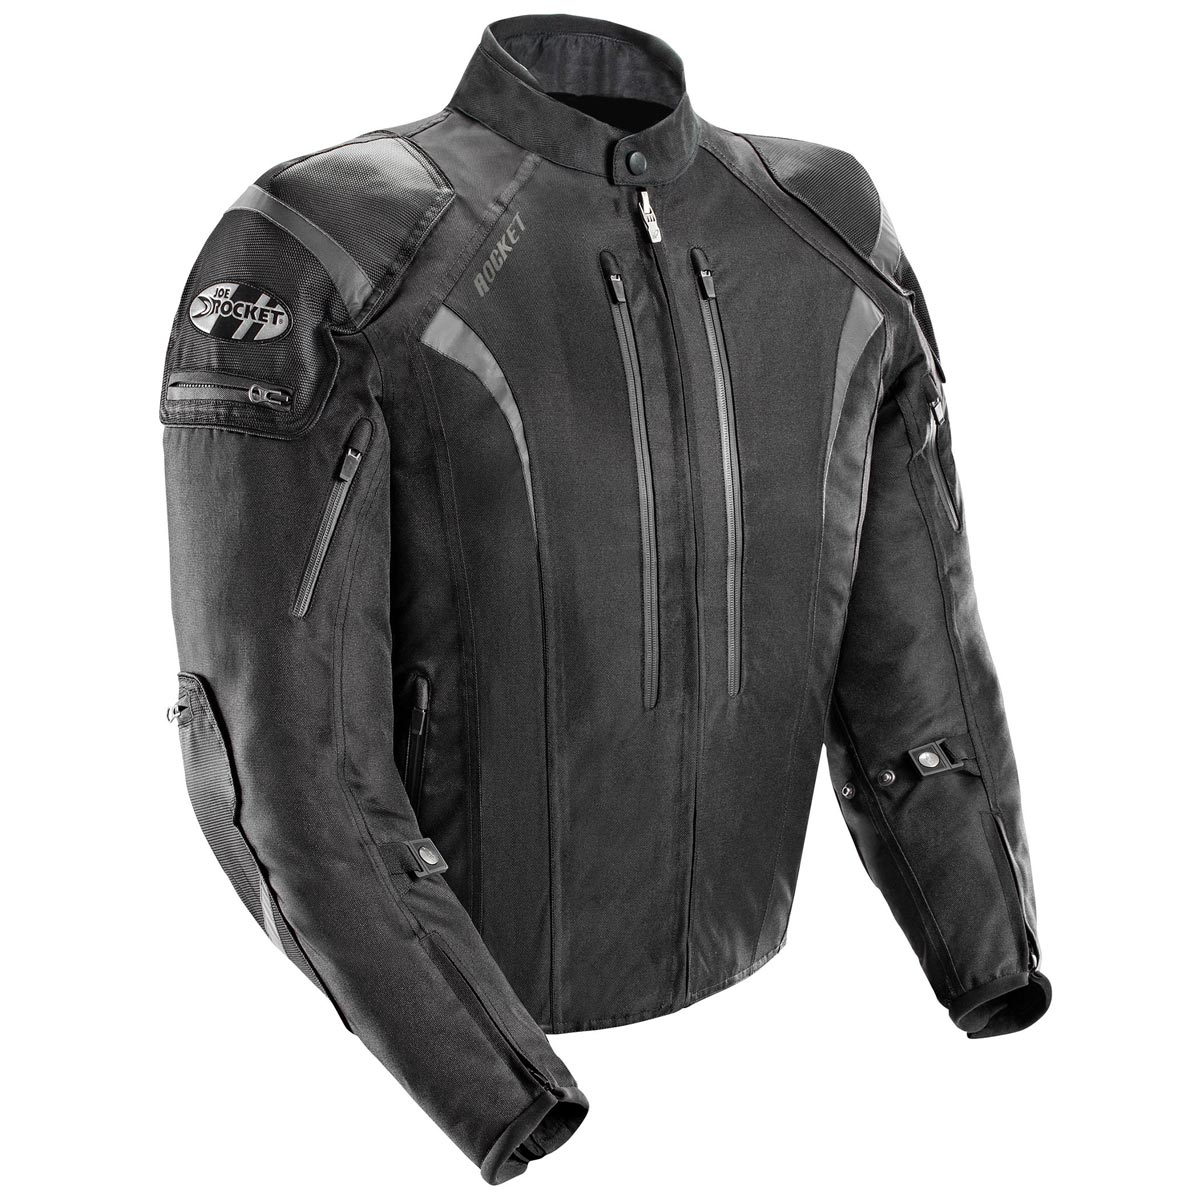 Joe Rocket Atomic 5.0 Mens Black Textile Jacket